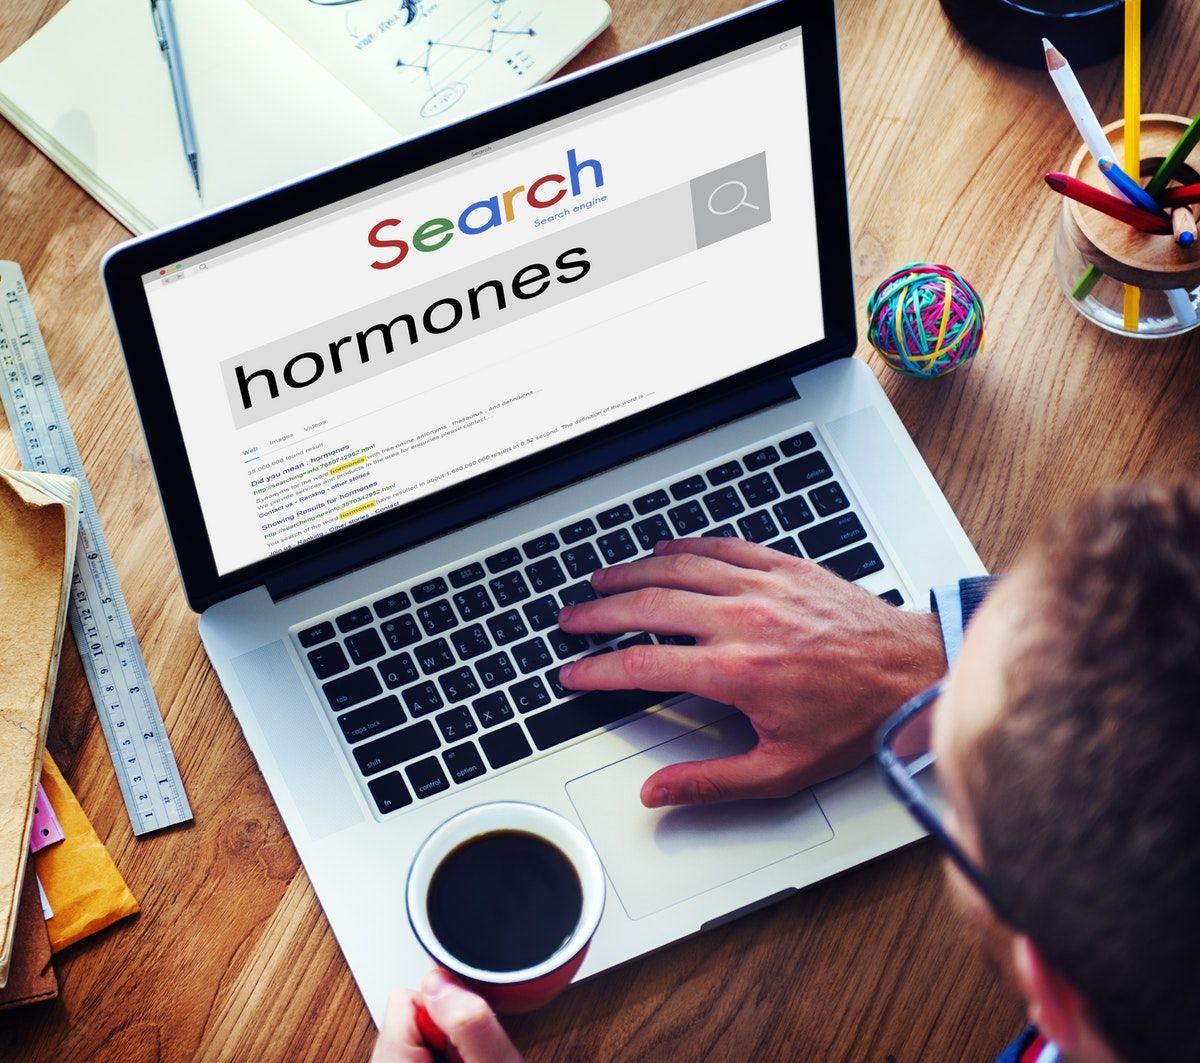 CBD's Health Benefits for Hormones